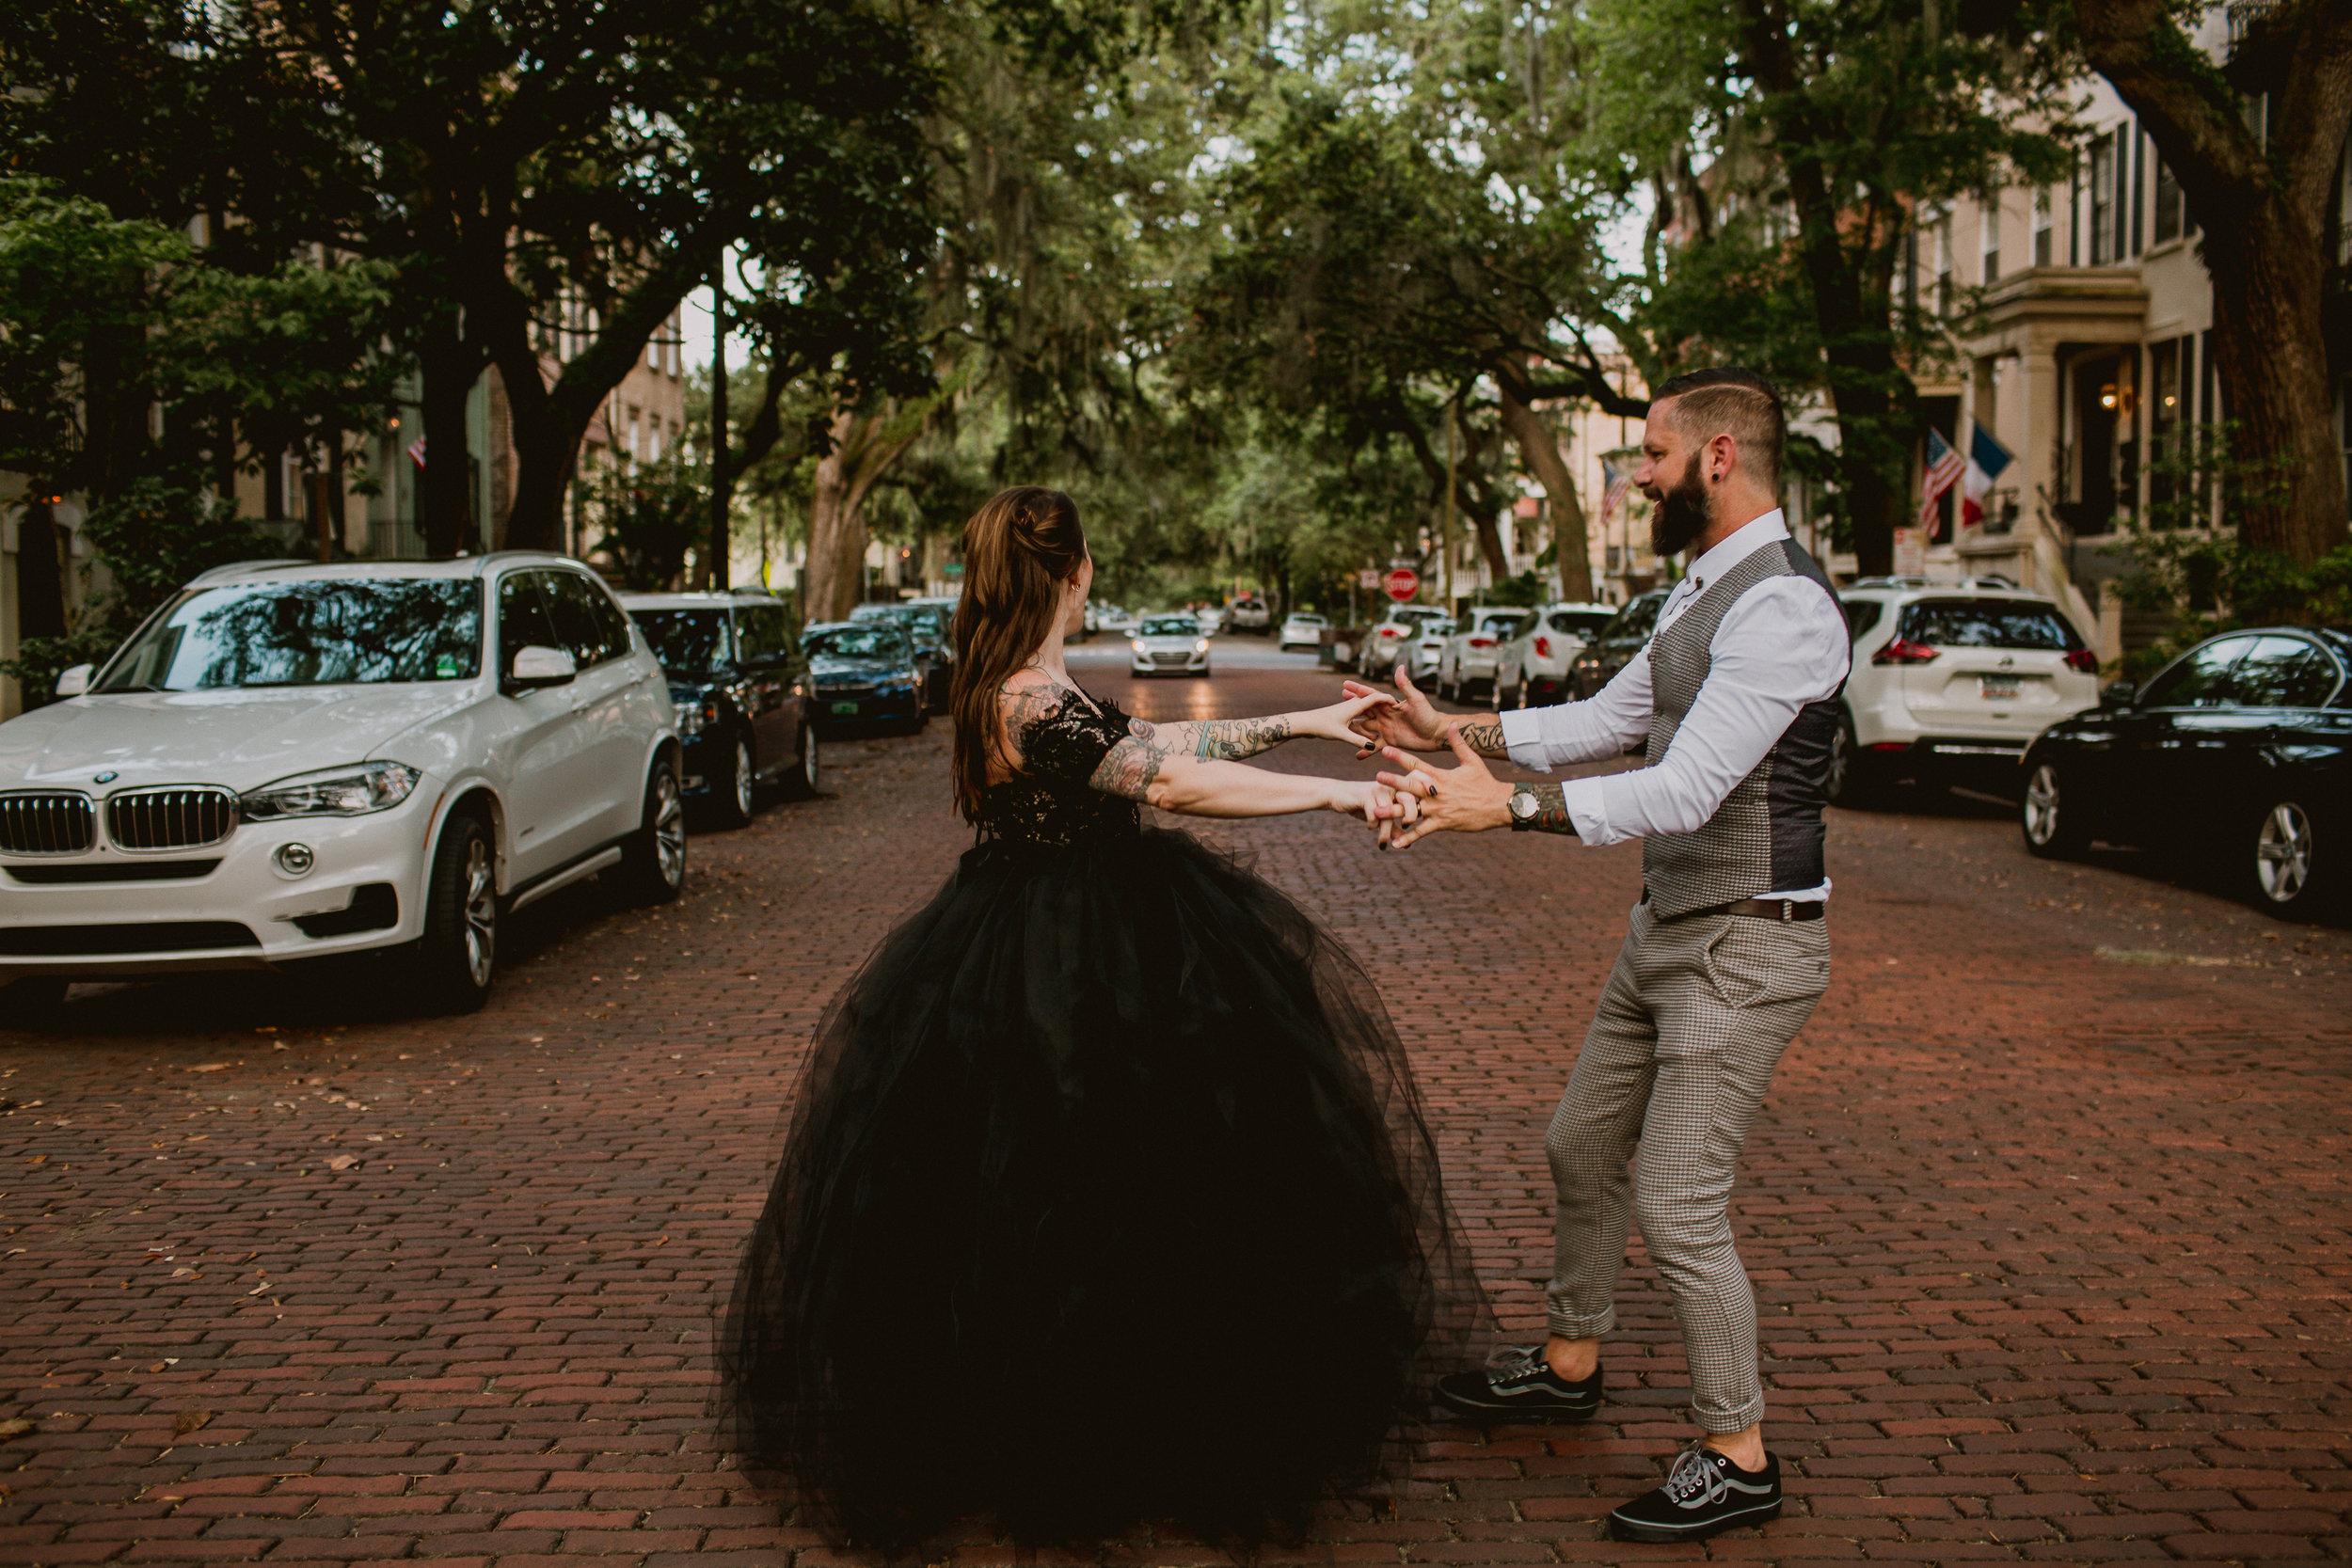 bohemian-hotel-savannah-elopement-kelley-raye-atlanta-wedding-photographer-132.jpg